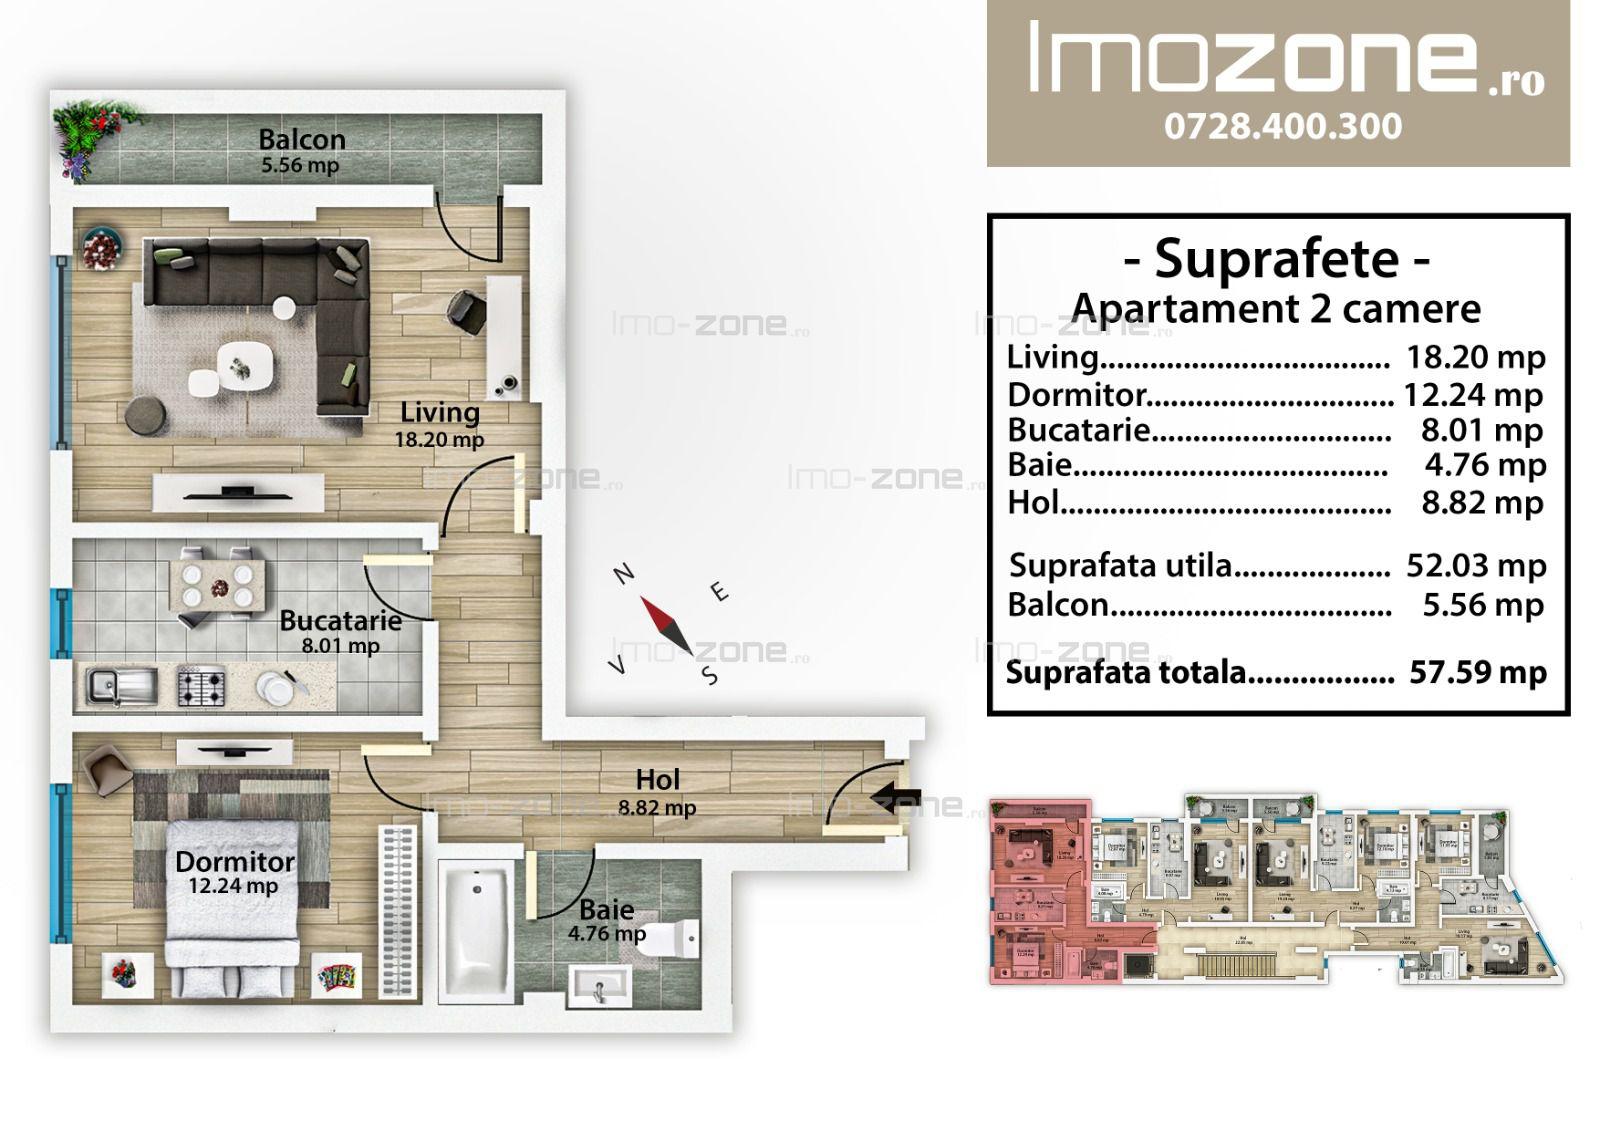 Mall Plaza, 2 camere, decomandat, etaj 3, bucatarie inchisa, balcon, 8min metrou